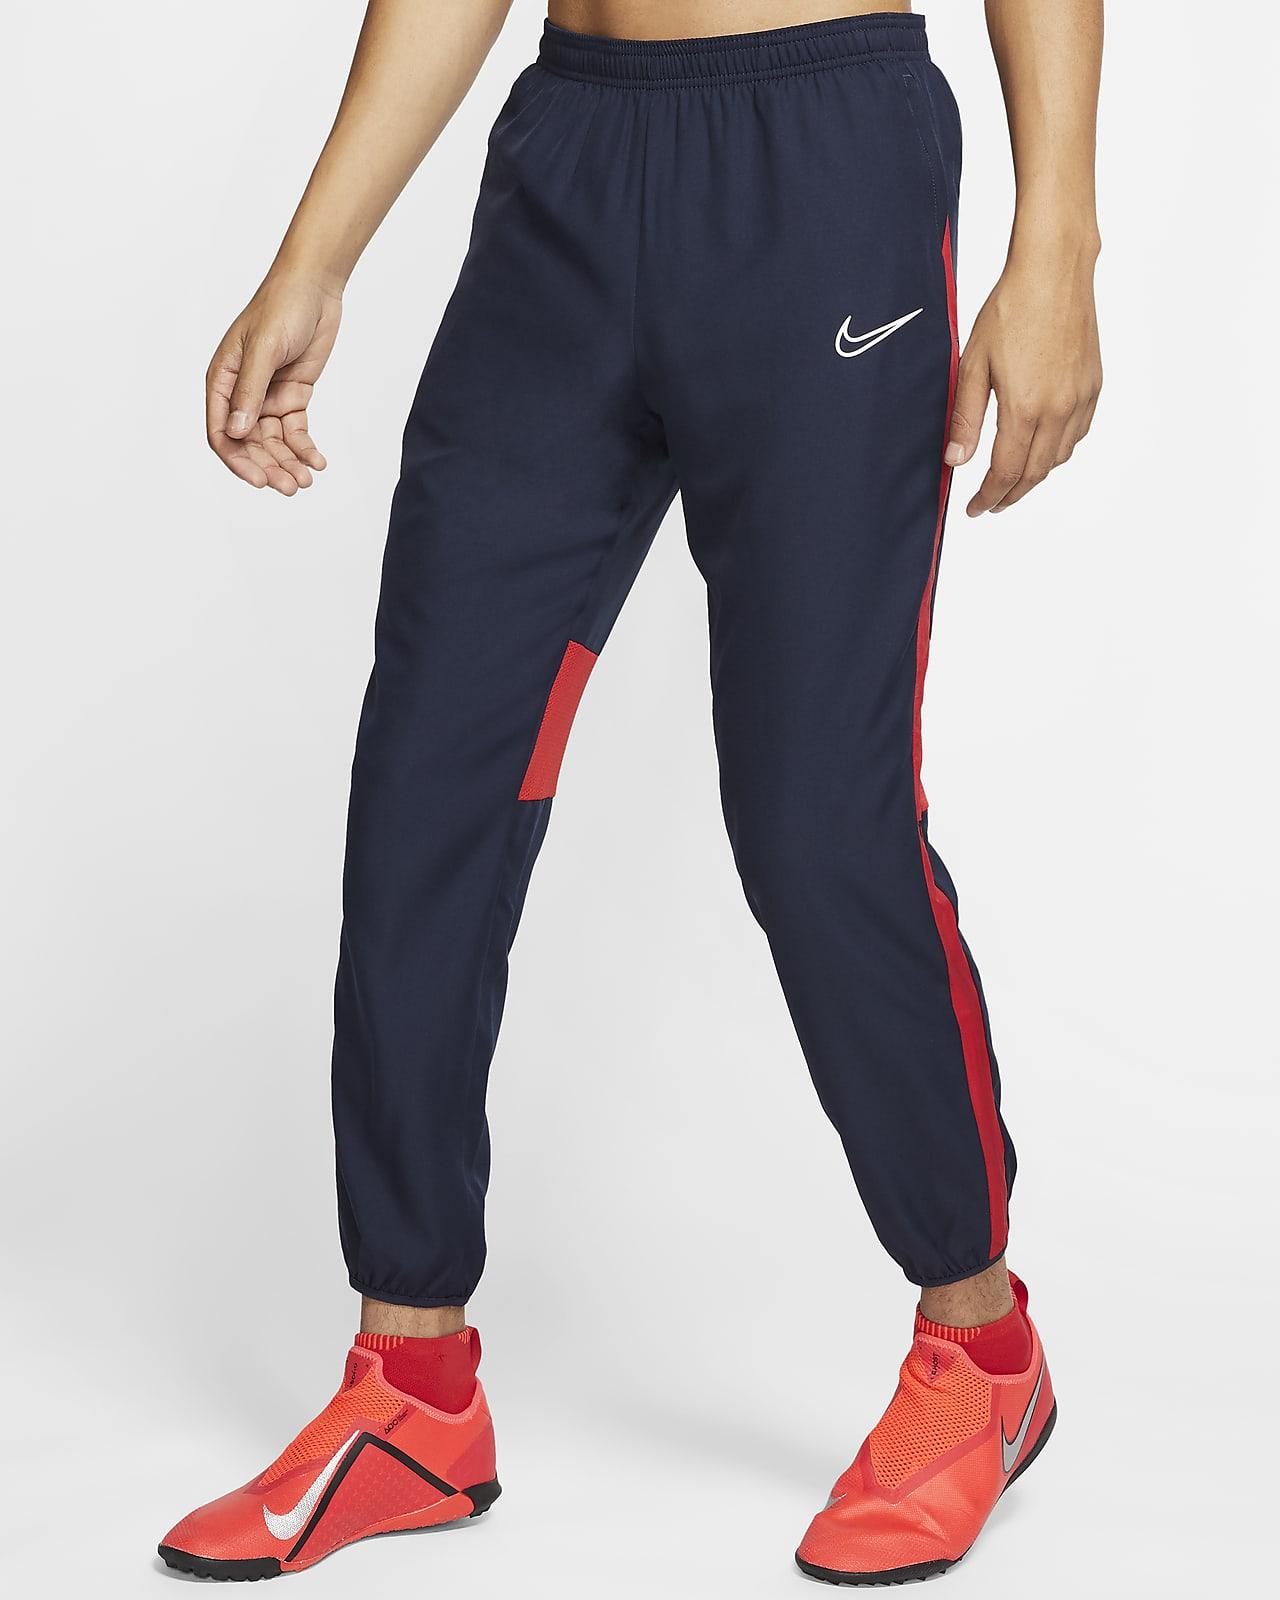 Pantalones De Futbol Ajustables Para Hombre Nike Dri Fit Academy Nike Cl